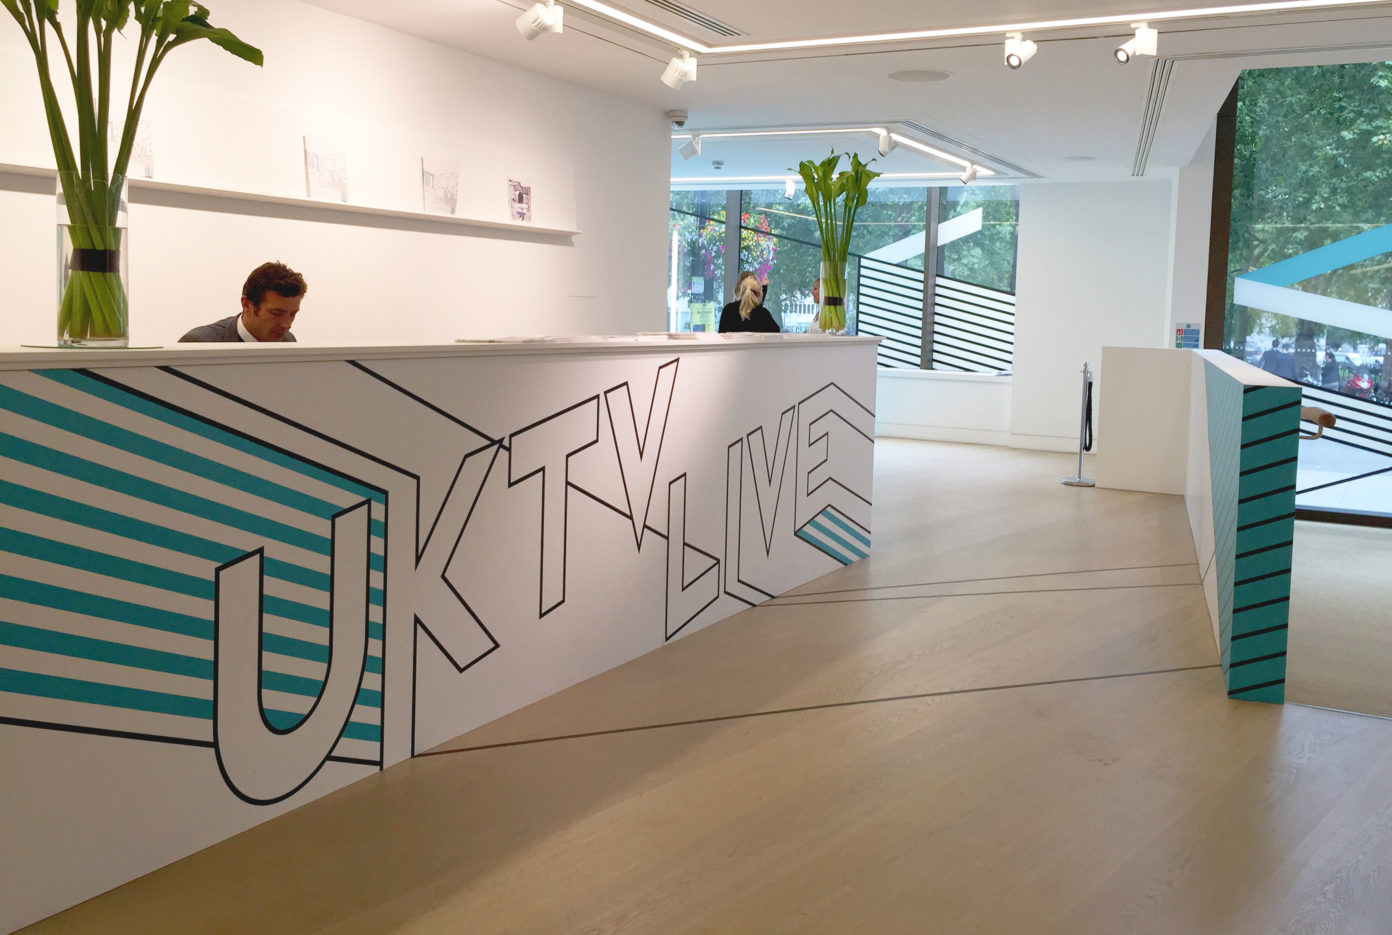 modern office interior design uktv. uktv live 2015 desk modern office interior design uktv